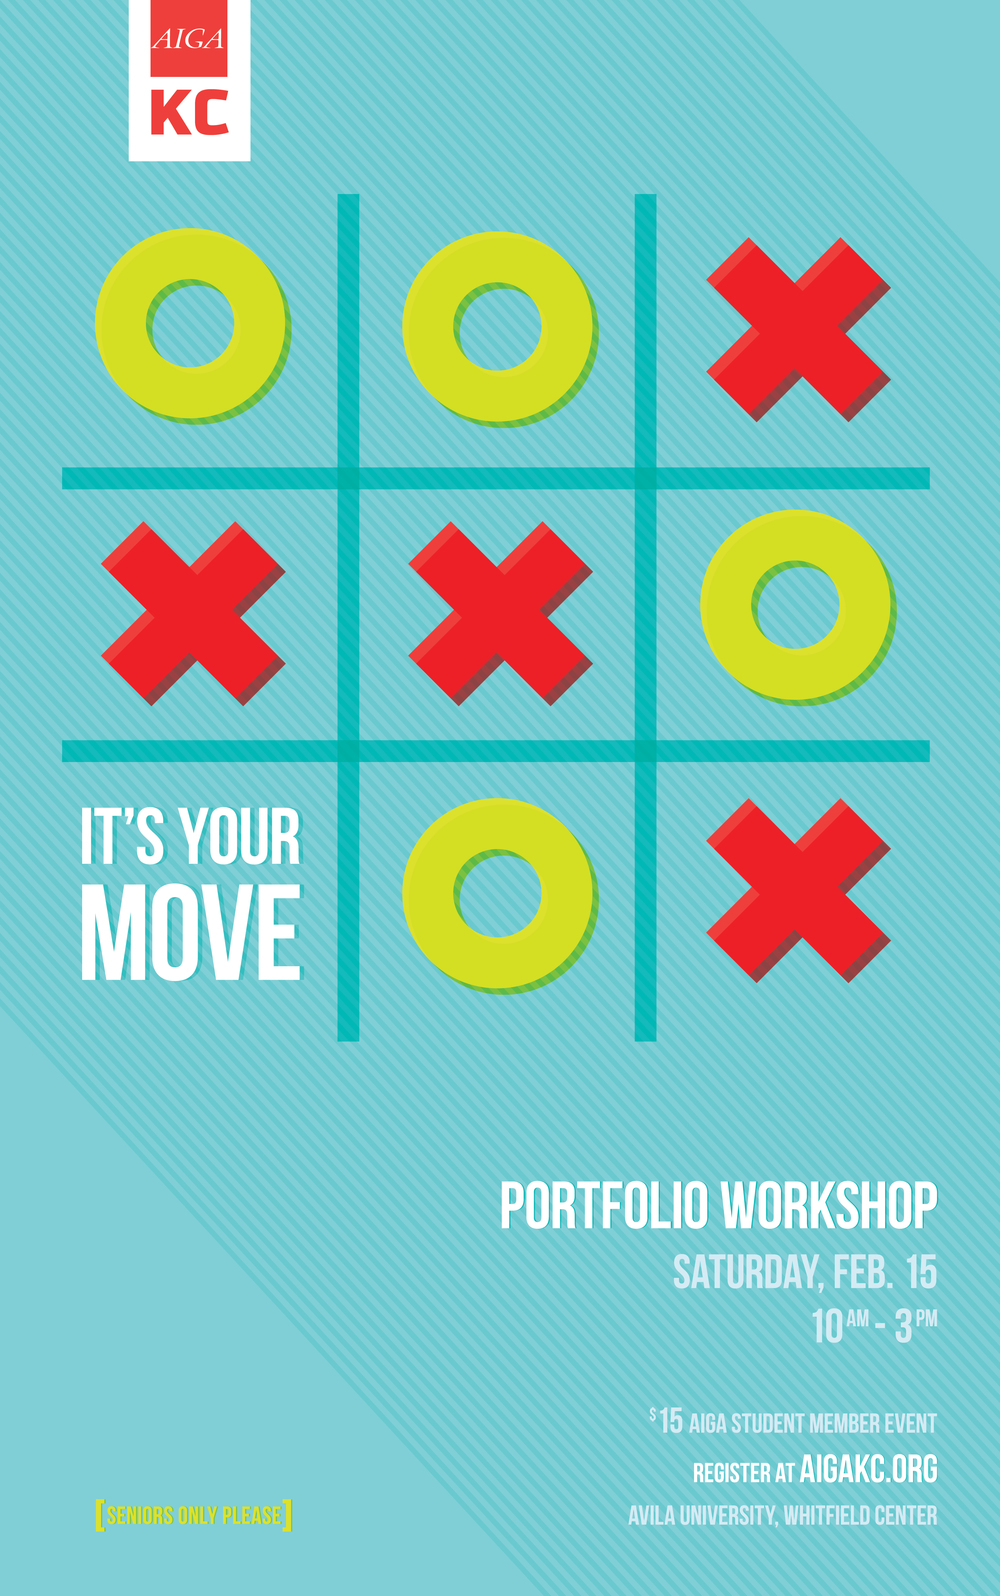 Port_wkhp_poster-01.jpg